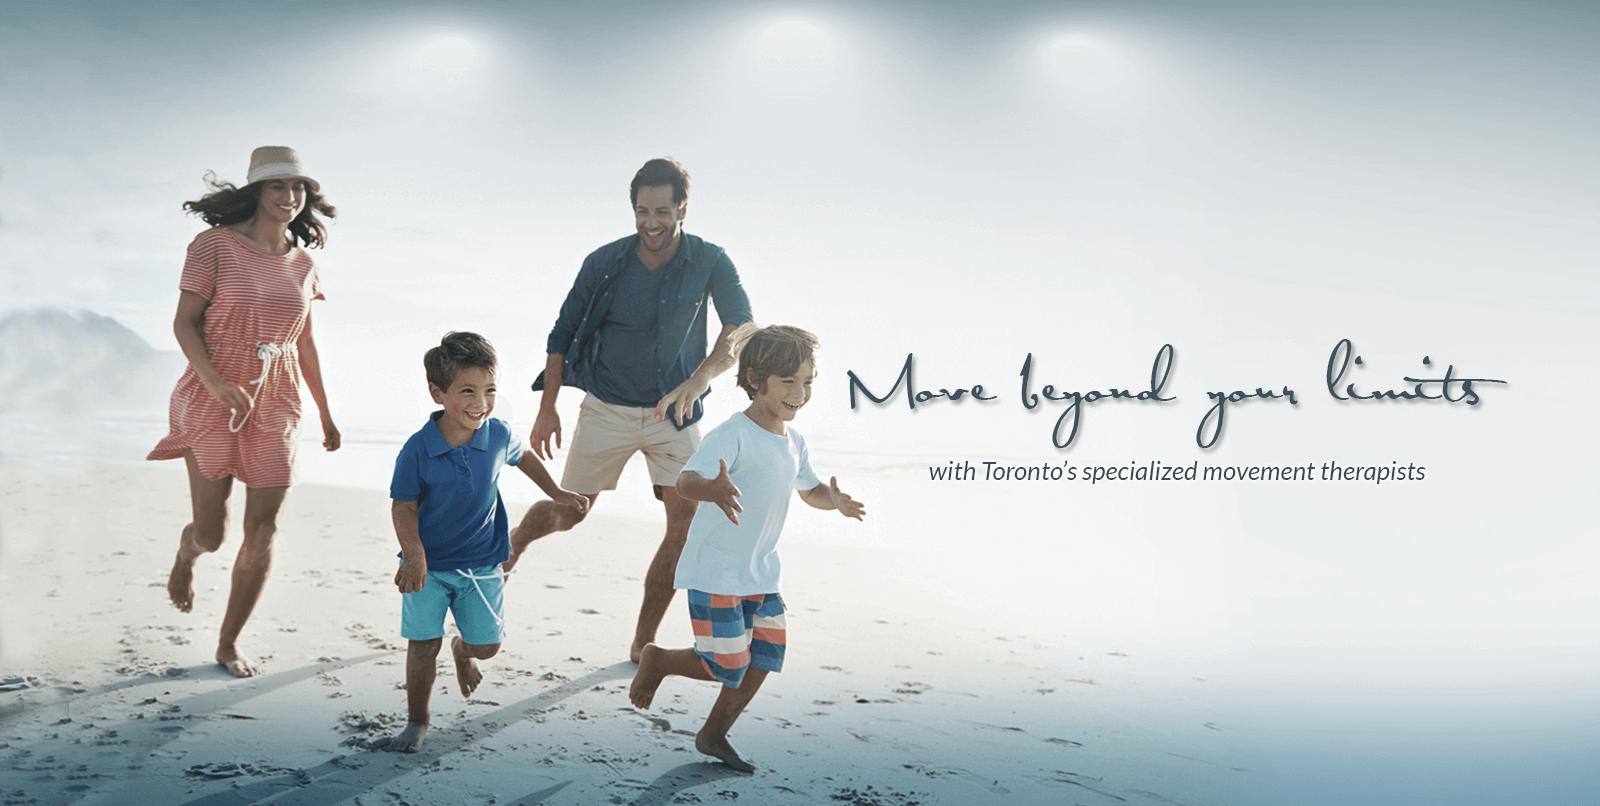 Family running on the sand